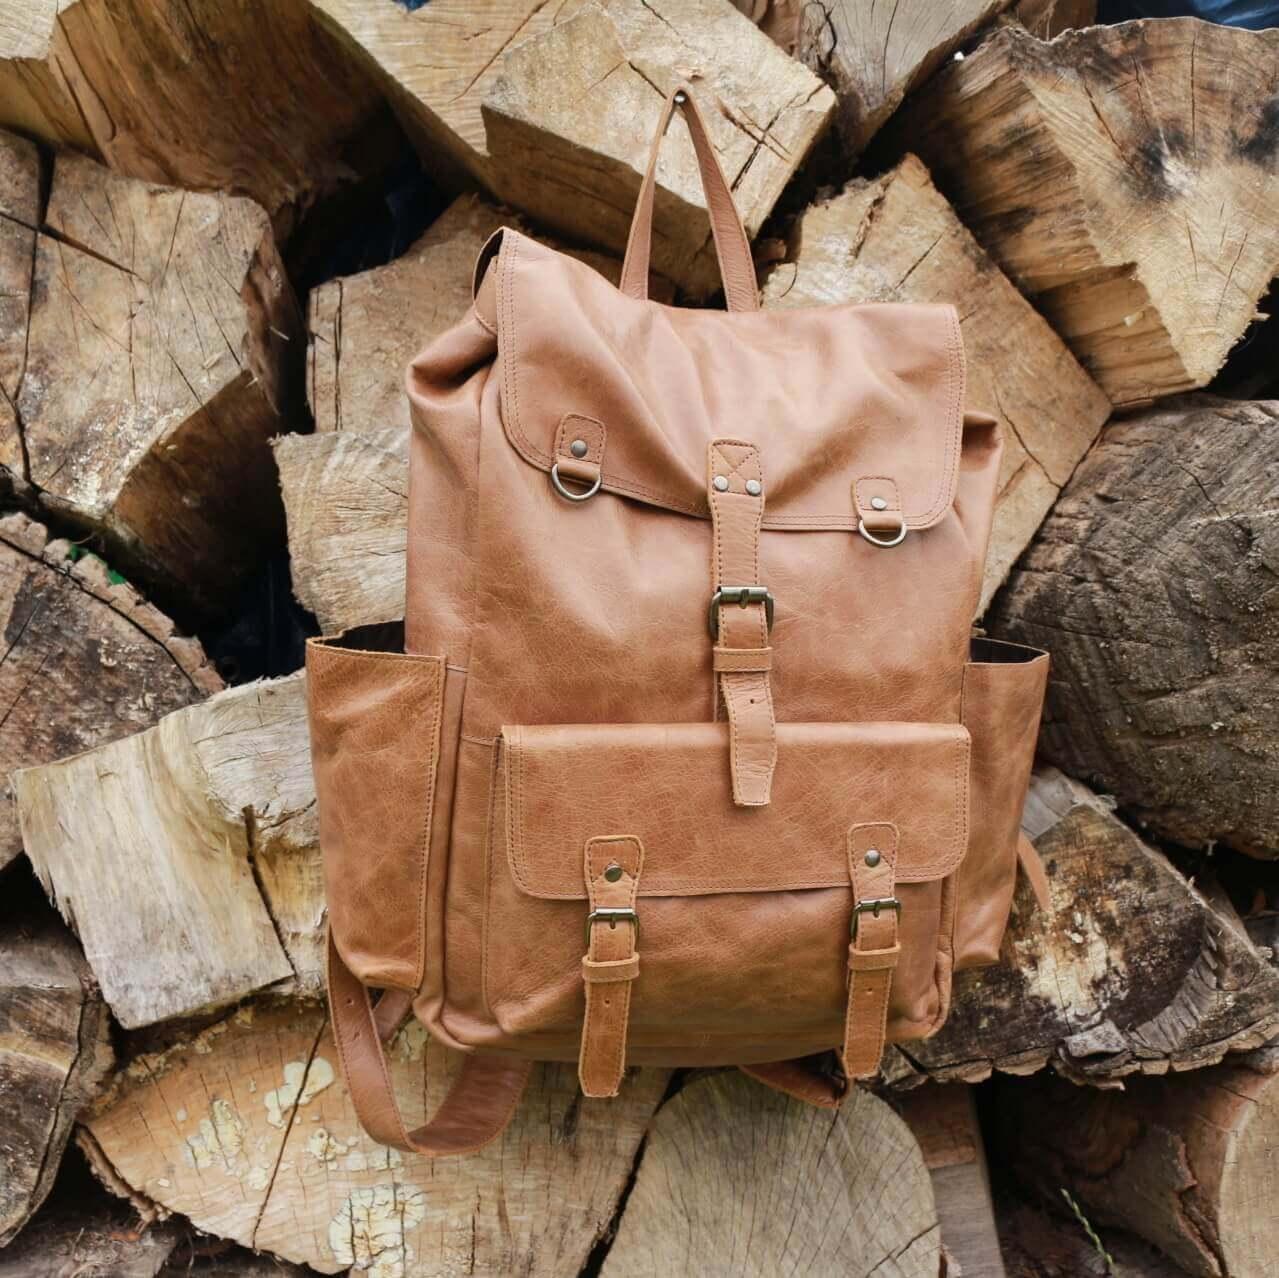 modny plecak